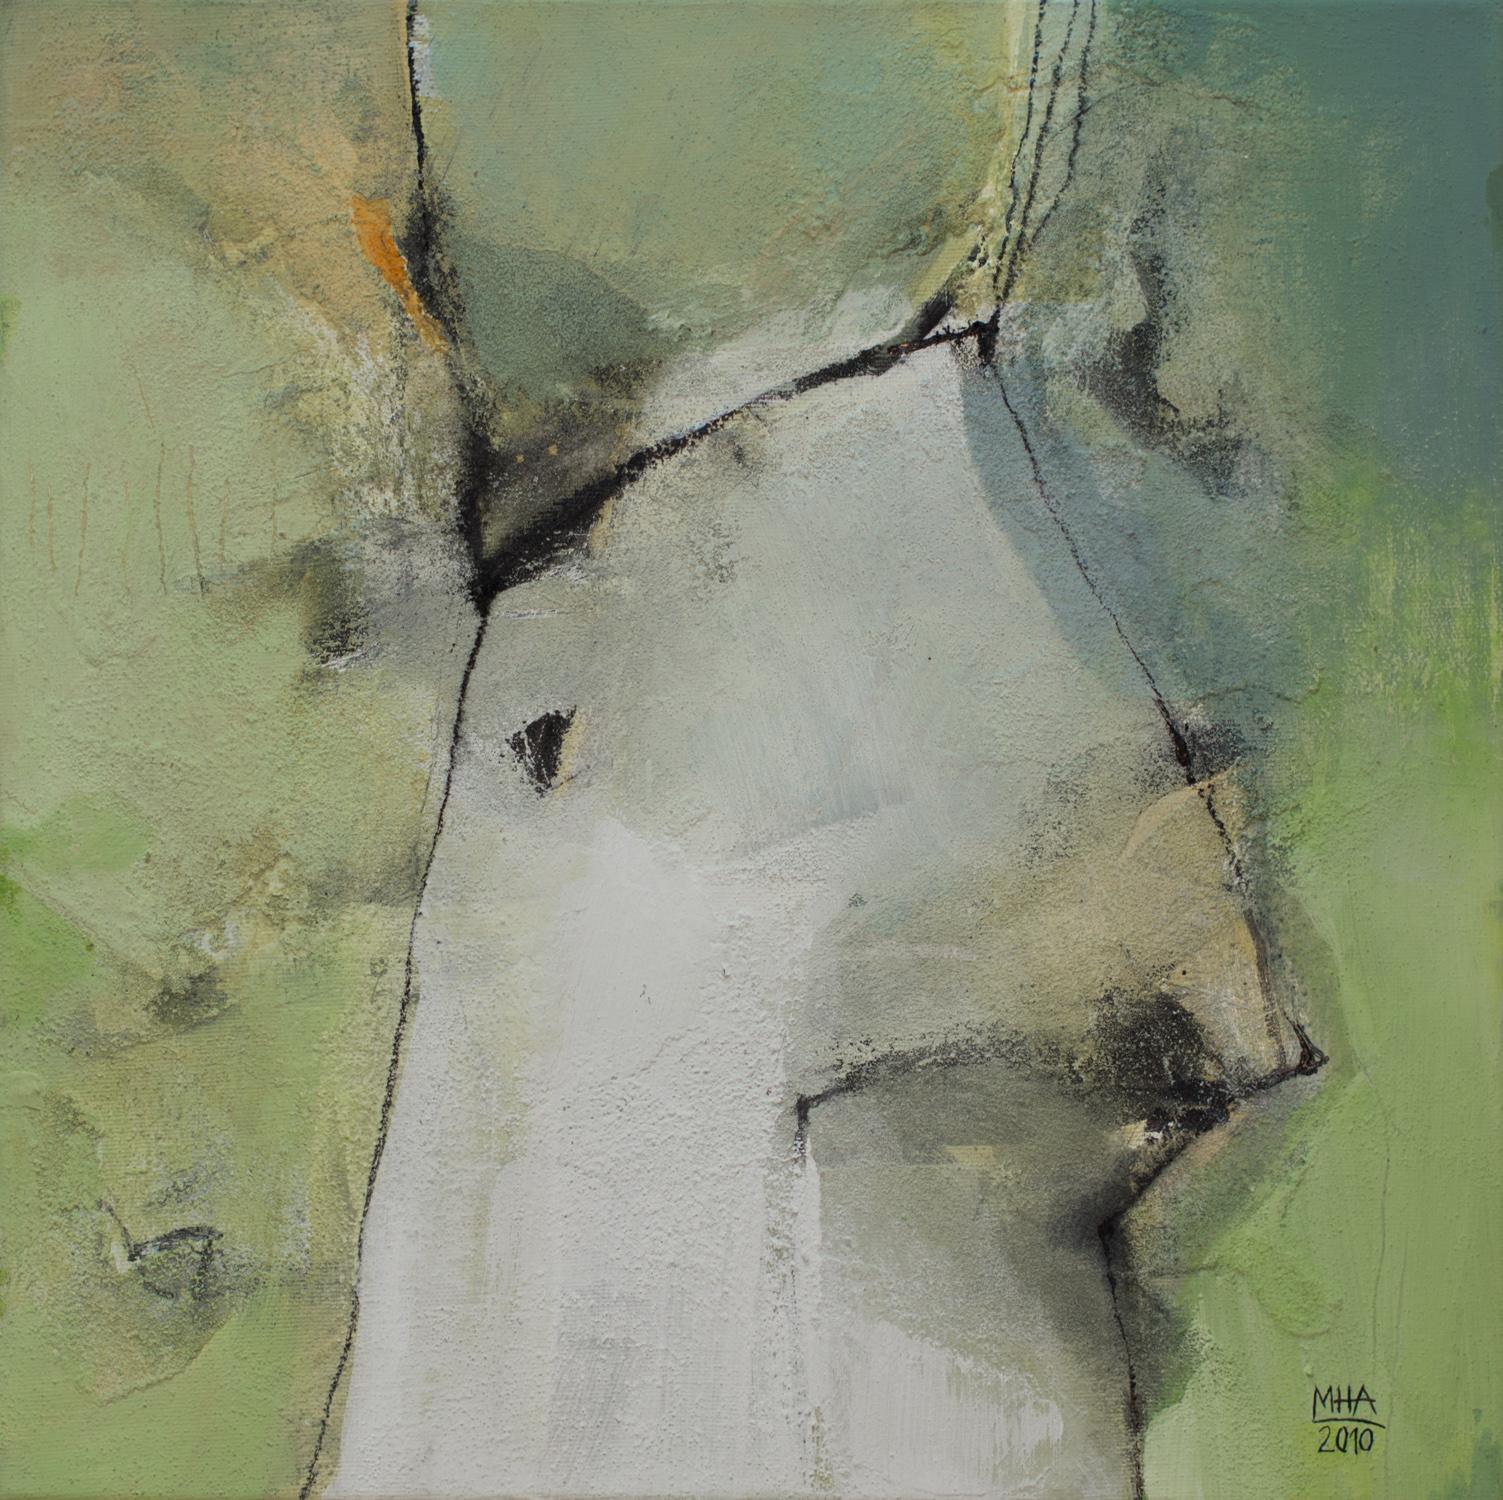 Kopf Nr. 2  ,  2011, Acryl auf Leinwand – Mischtechnik , 40x40 cm